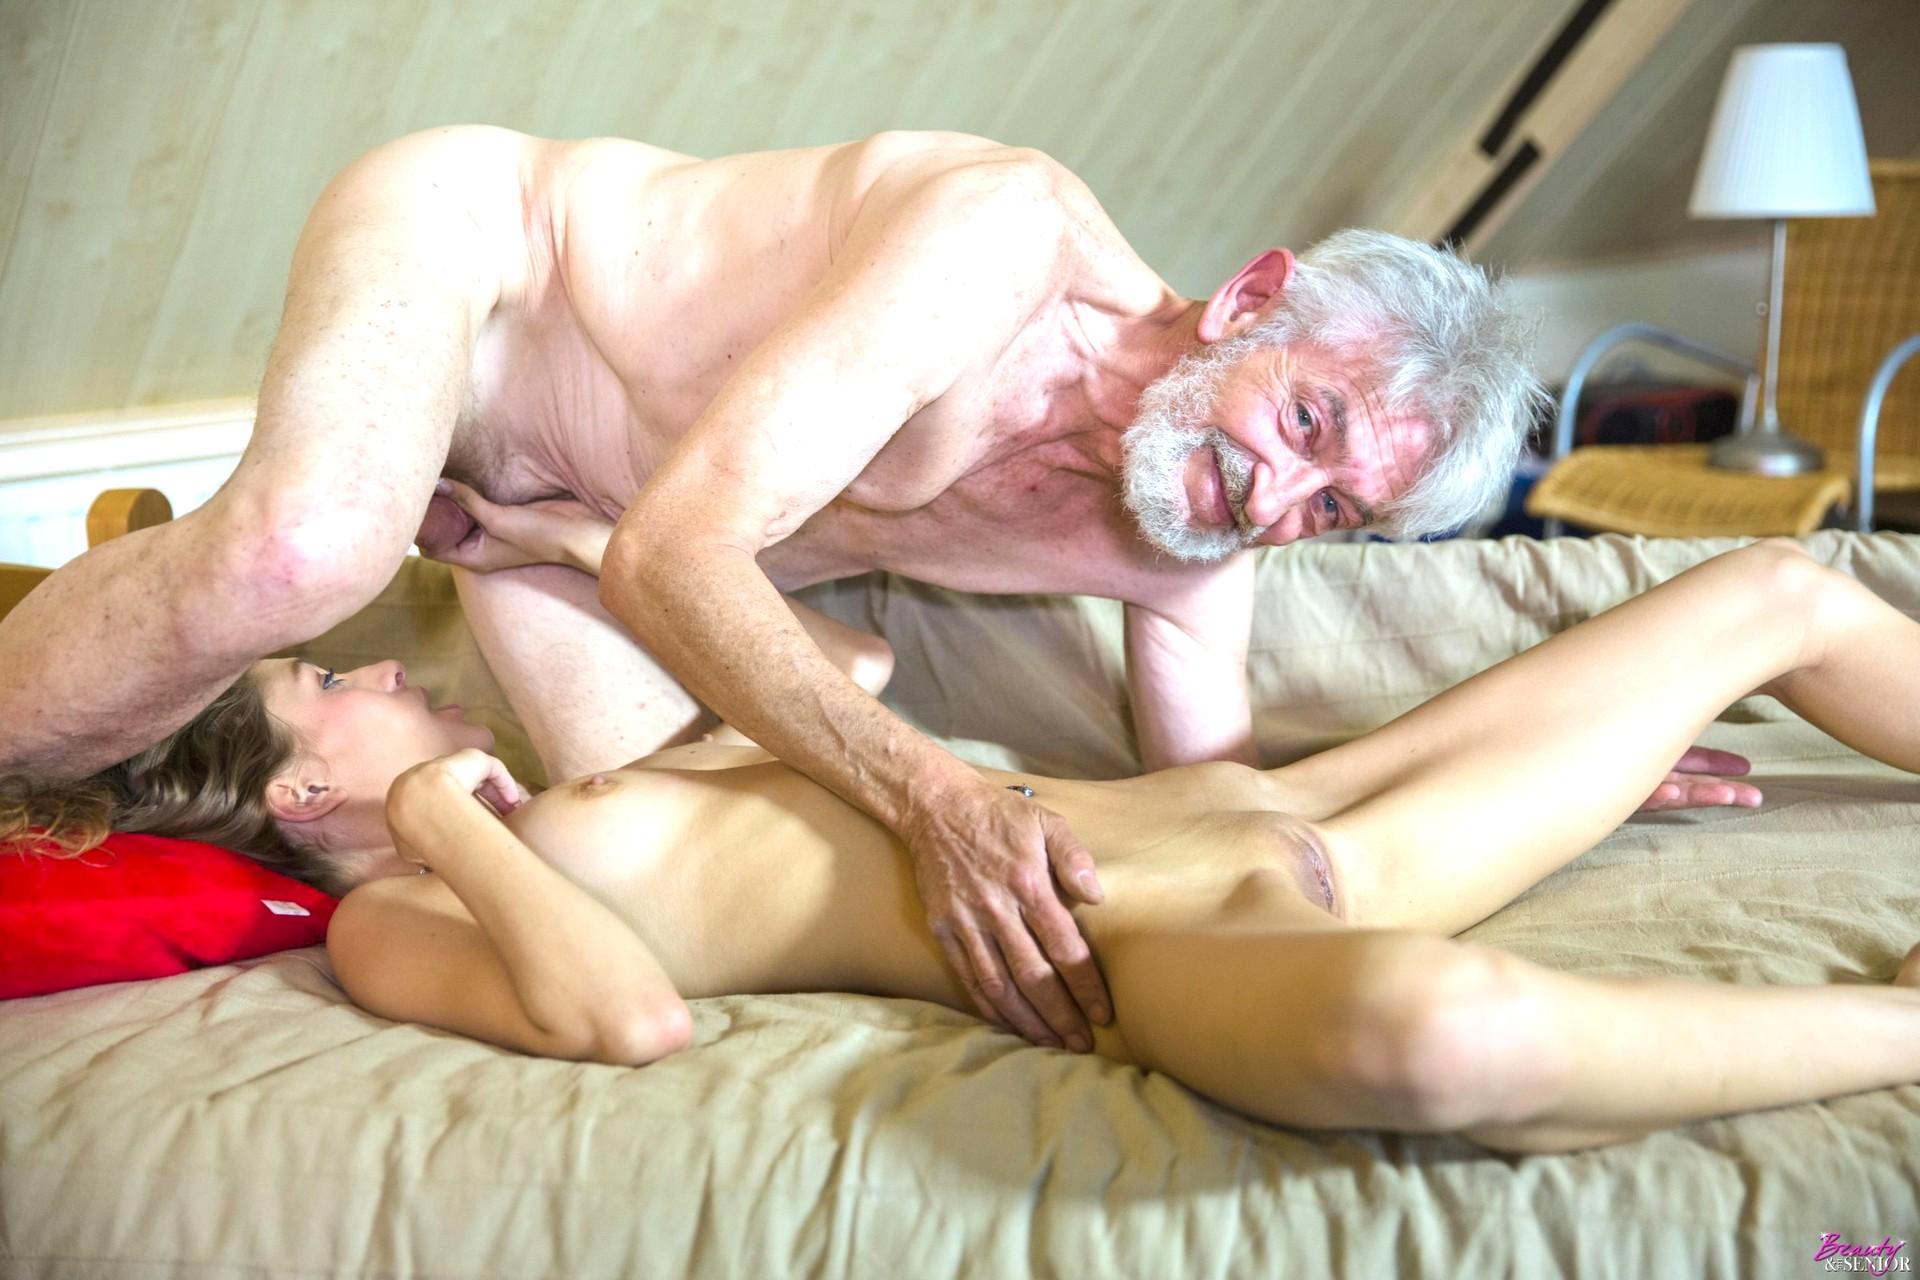 stariki-i-moloduhi-porno-intim-foto-antonina-komissarova